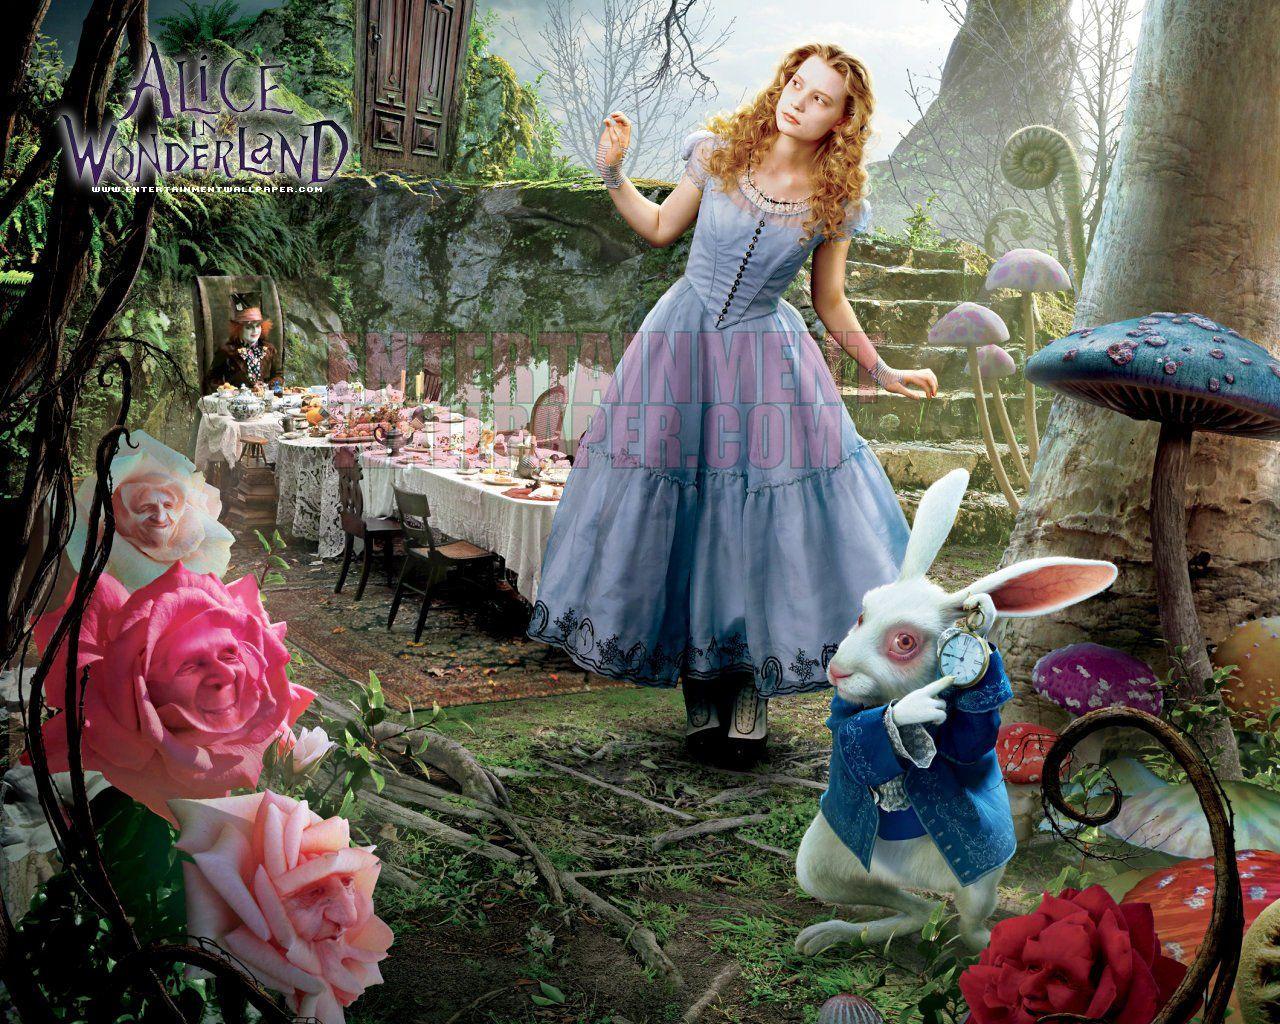 Alice In Wonderland Wallpaper 10020177 Desktop Download Page Hd